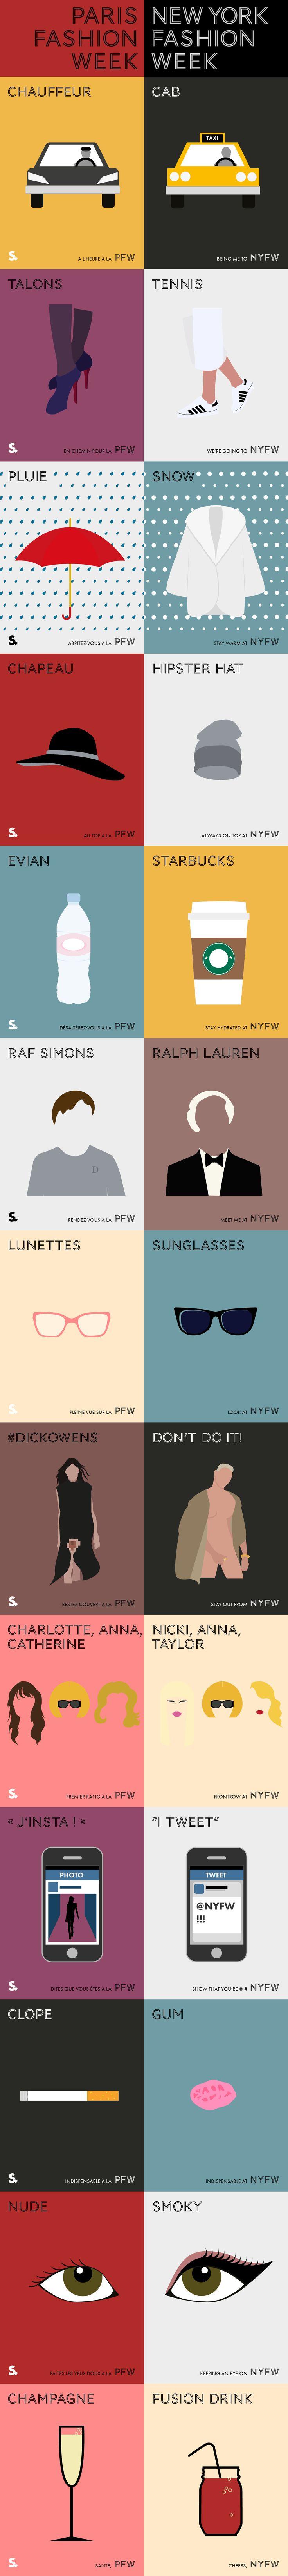 Paris vs New York Fashion Week #infographic #illustration